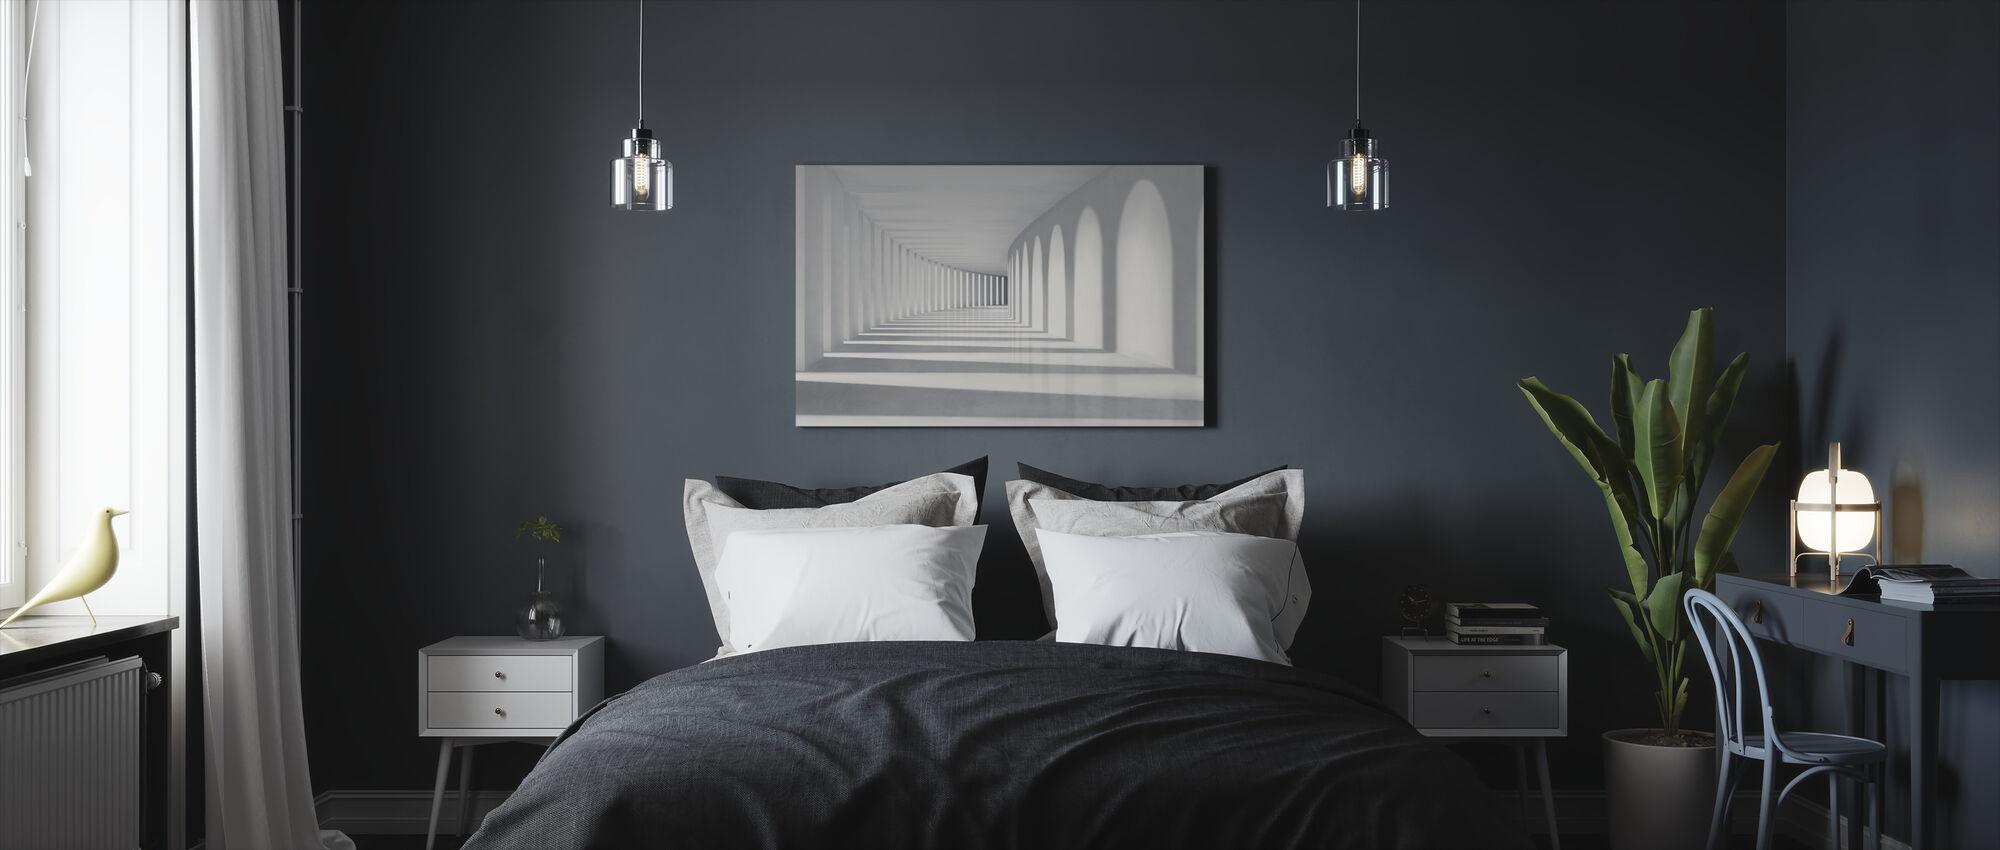 Colons - Canvas print - Bedroom